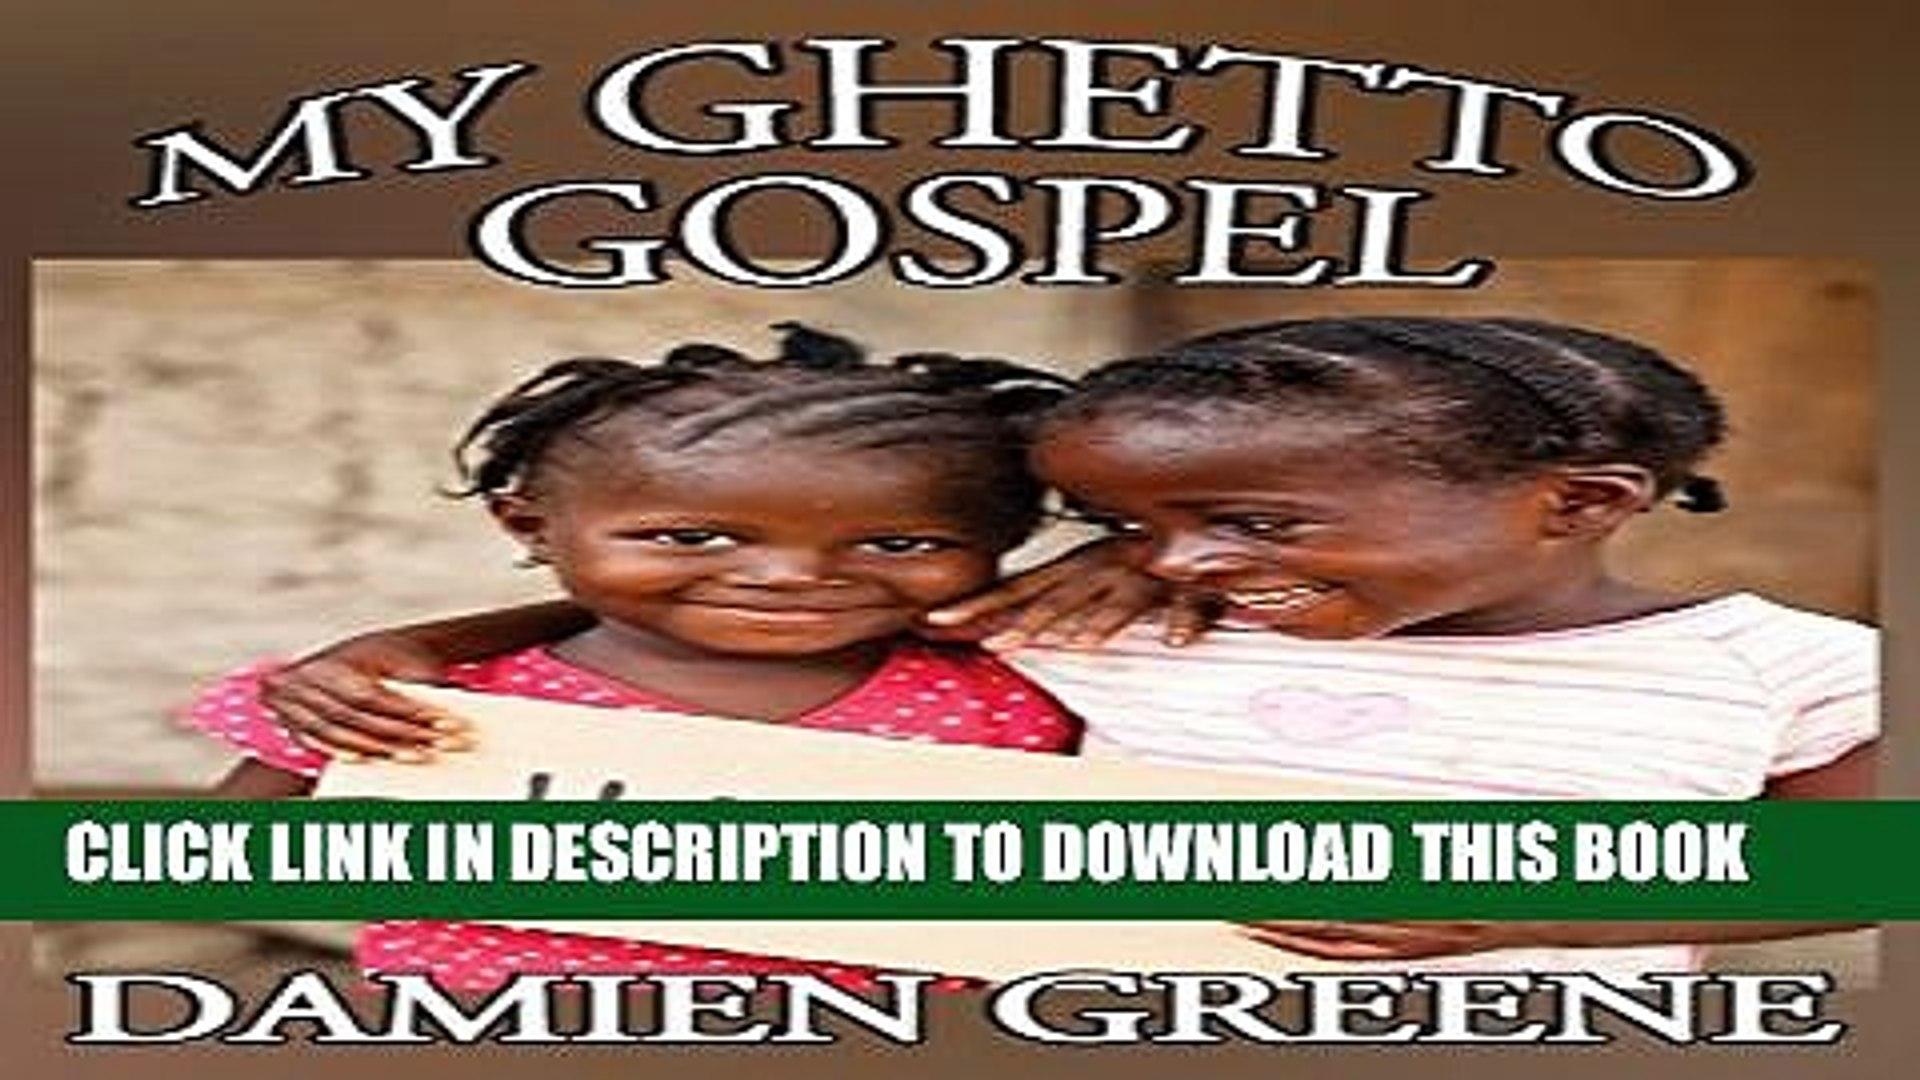 2pac ghetto gospel download